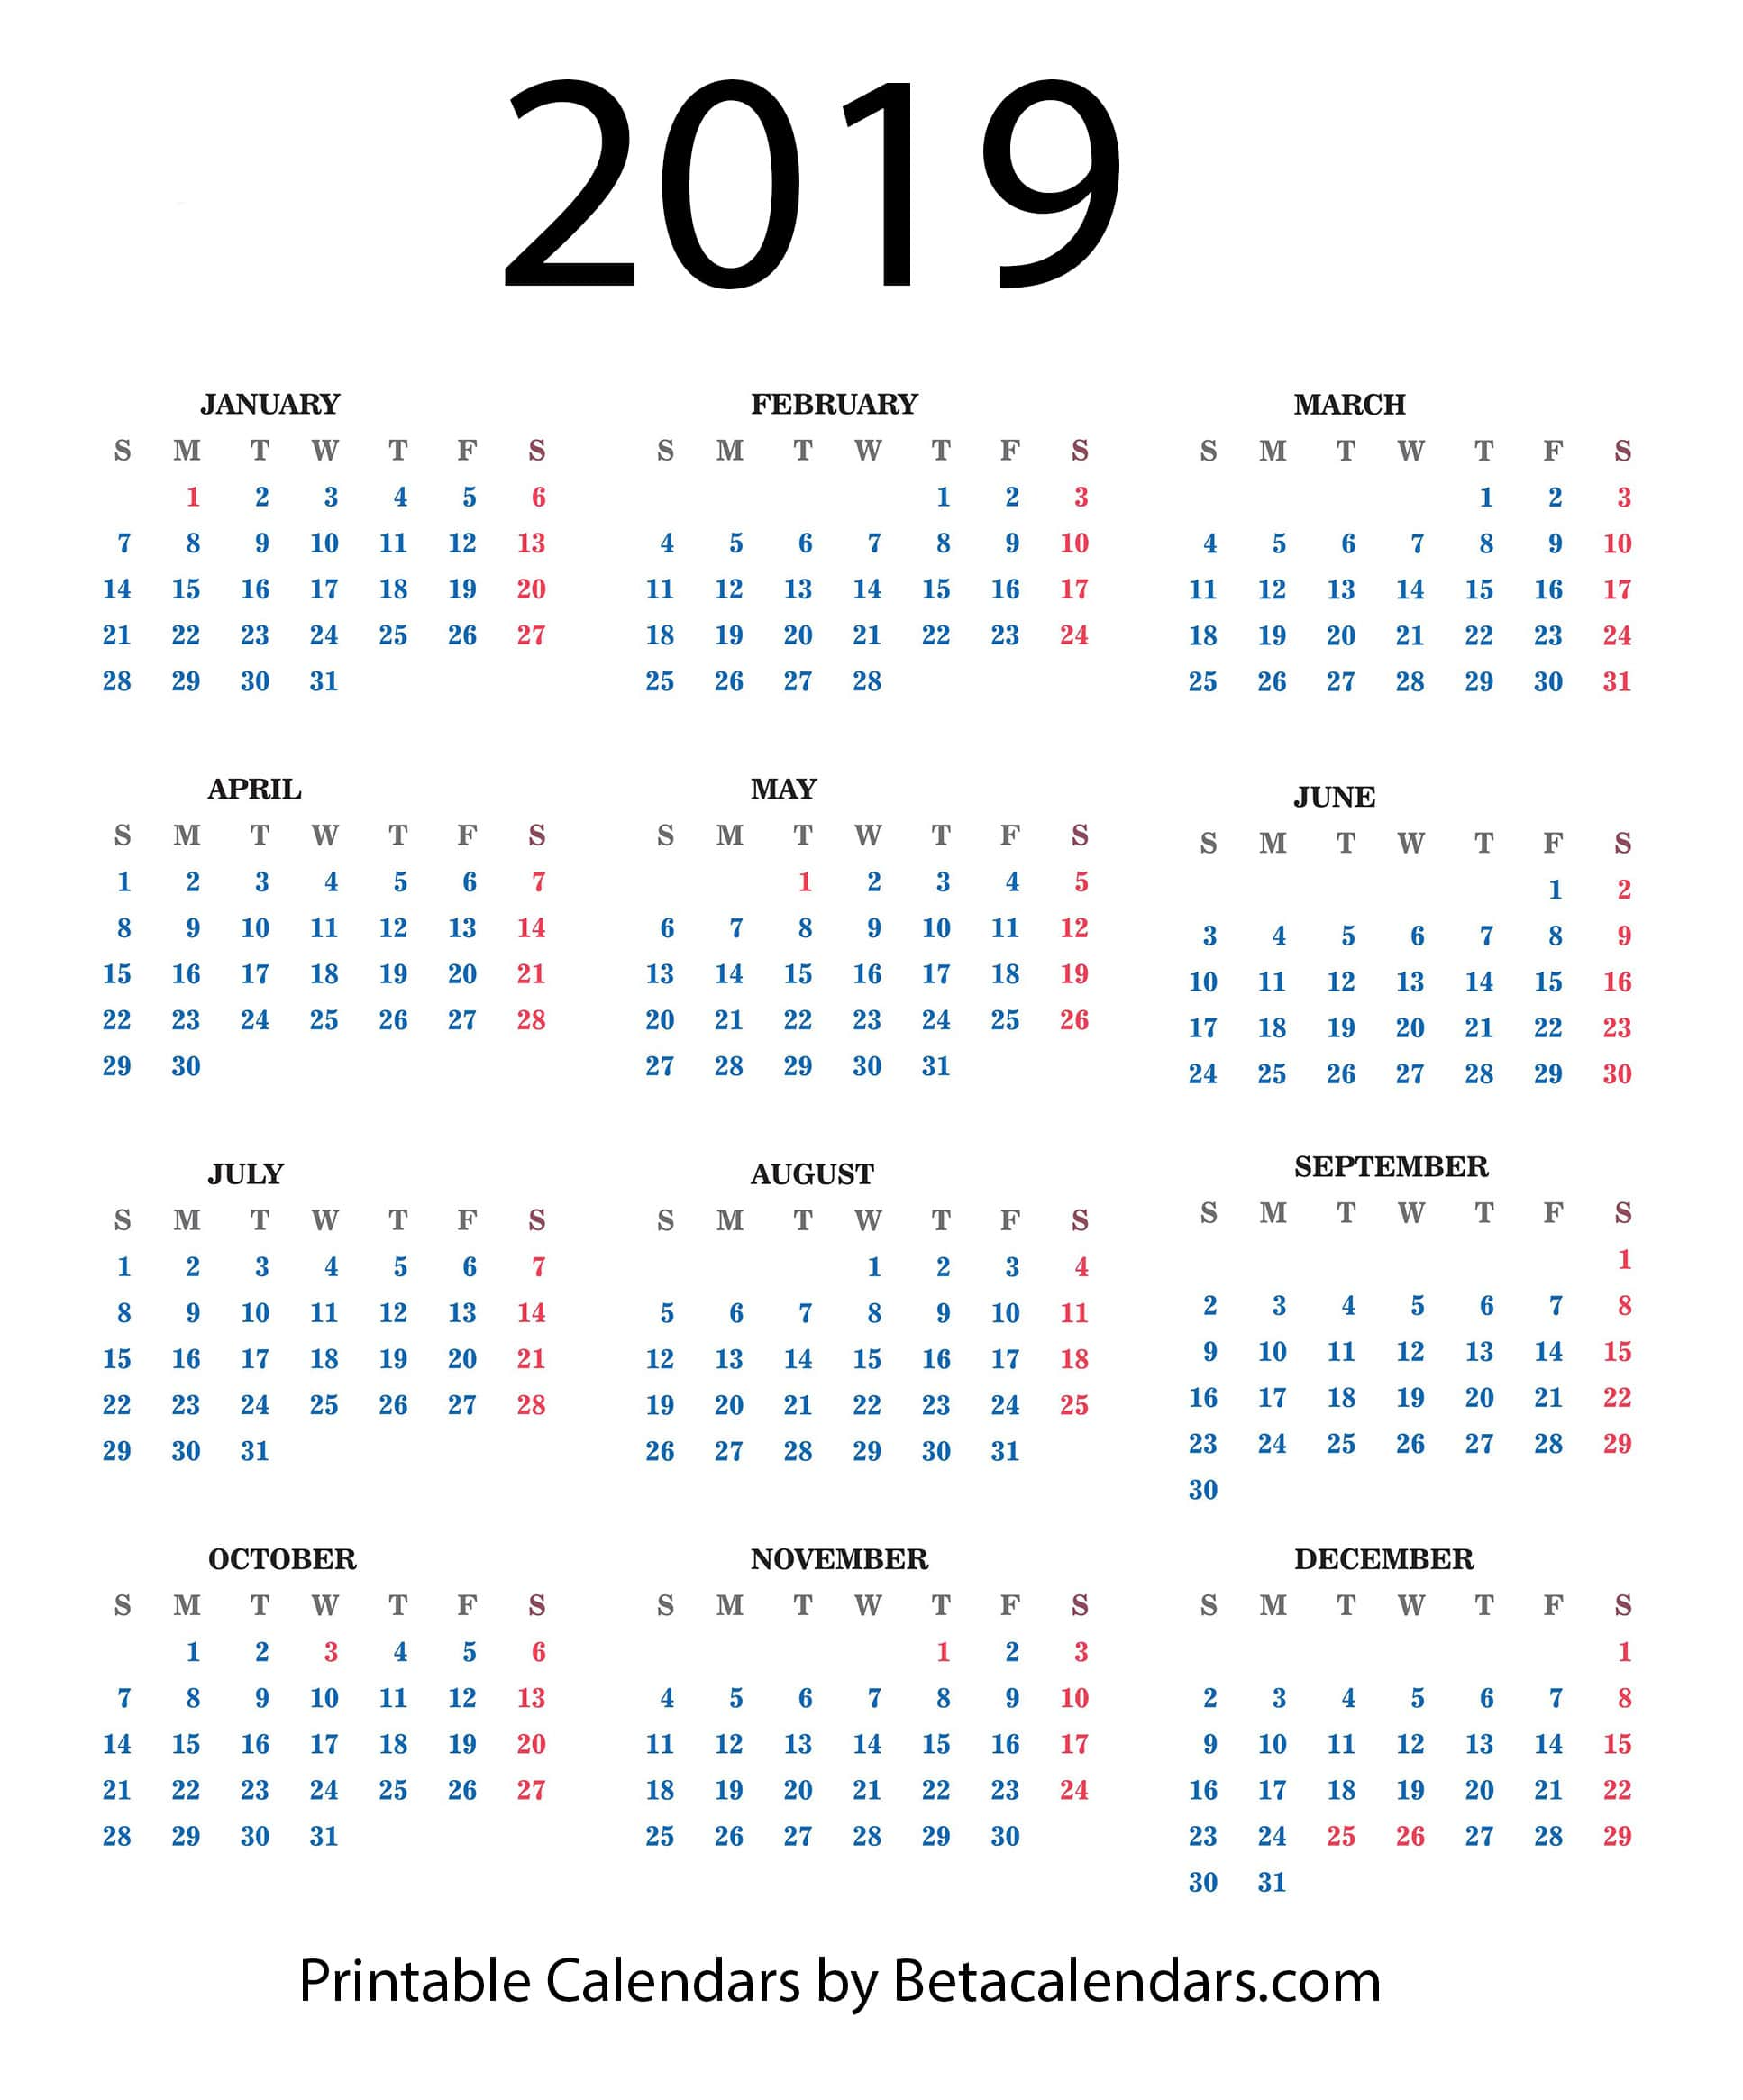 Beta Calendars